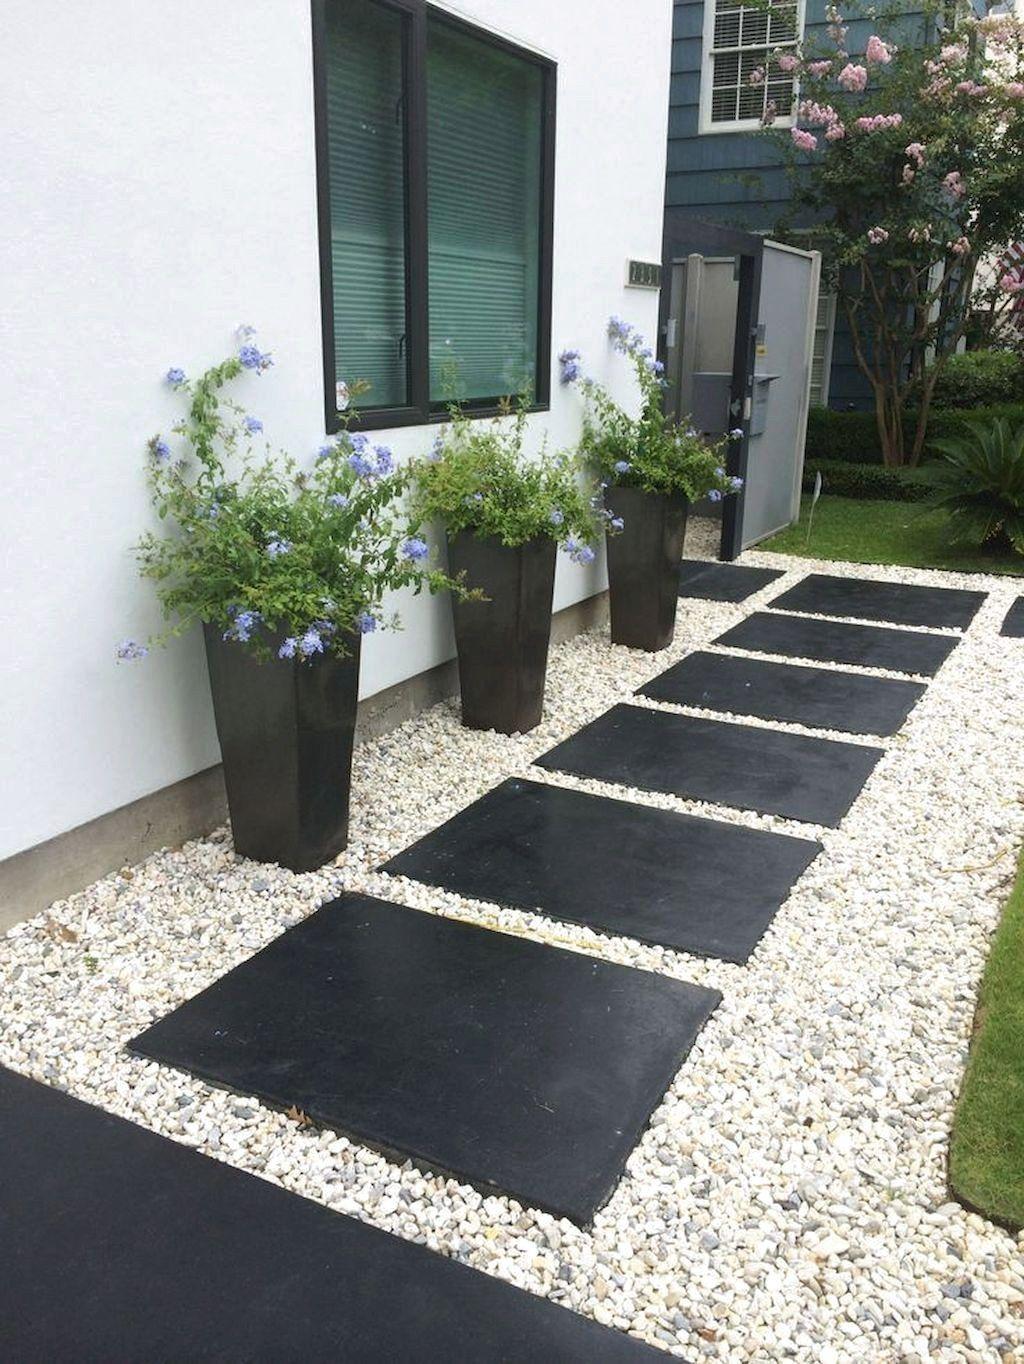 Photo of Small Garden Design Ideas Low Maintenance #SmallGardenDesign #SmallGardenLowMaintenance #SmallGarden